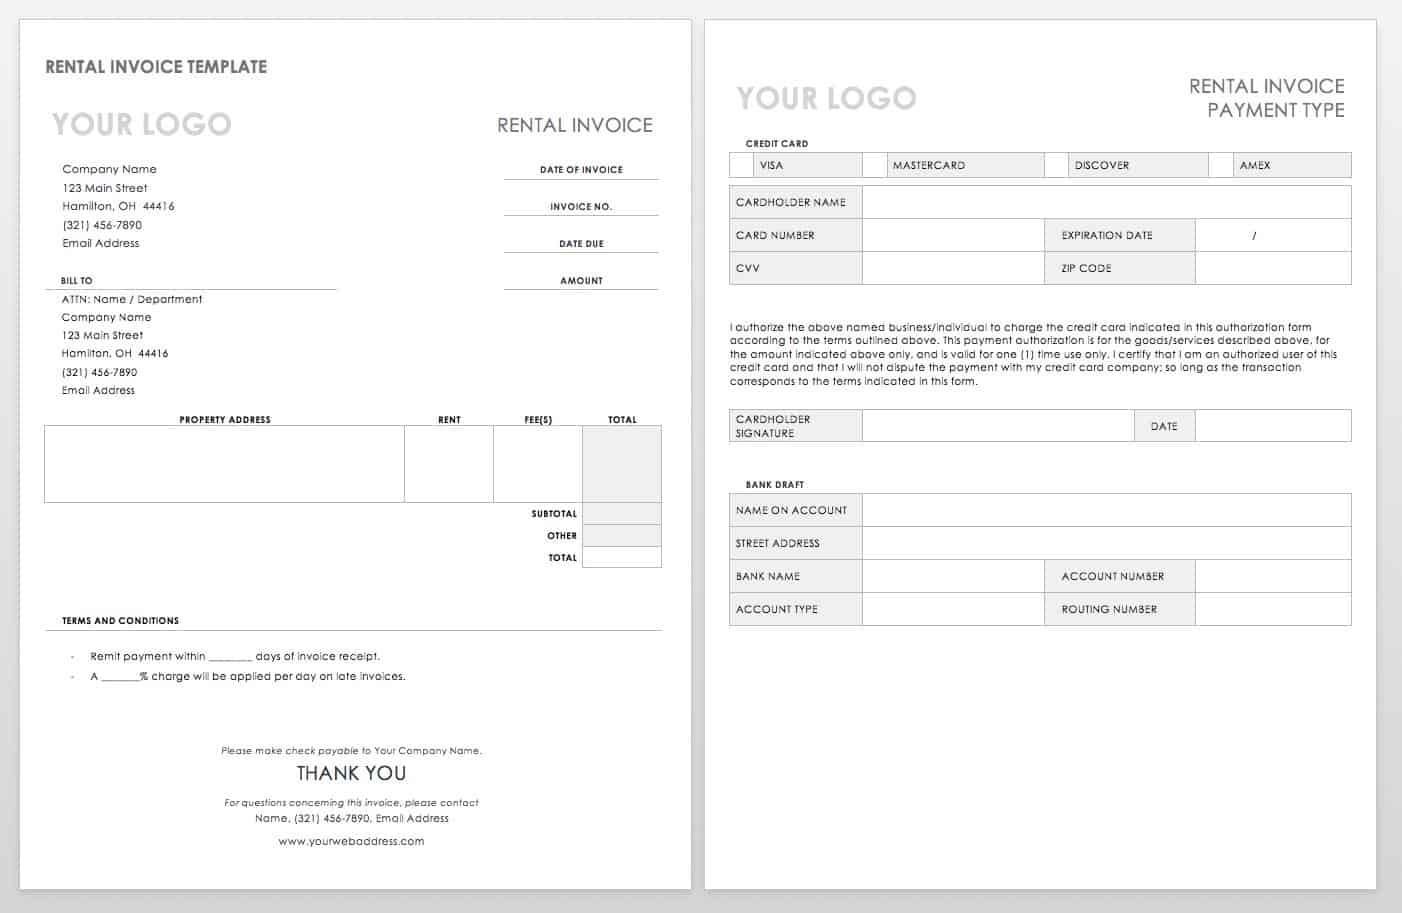 55 free invoice templates smartsheet lodge bill format in word